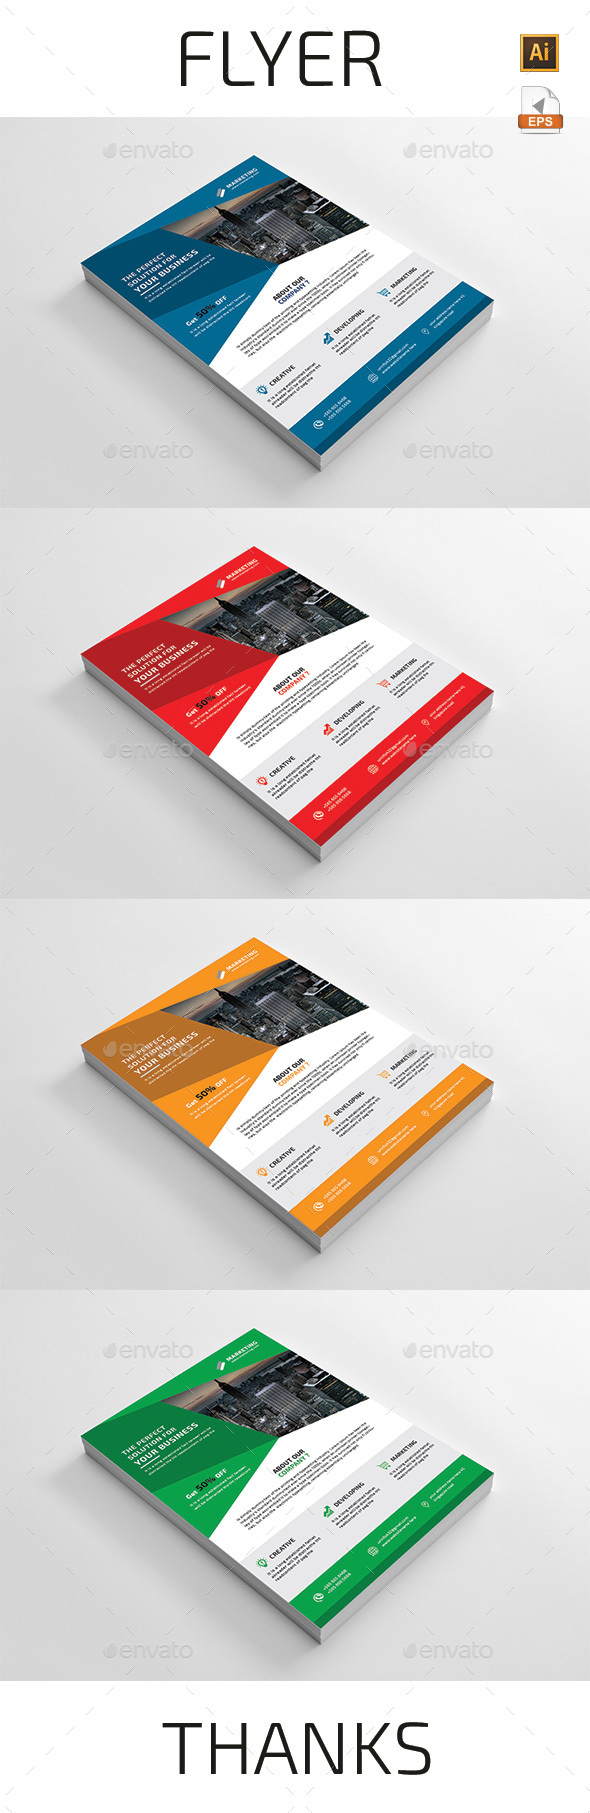 Flyer Template Vector EPS, AI Illustrator | Flyer Templates | Pinterest